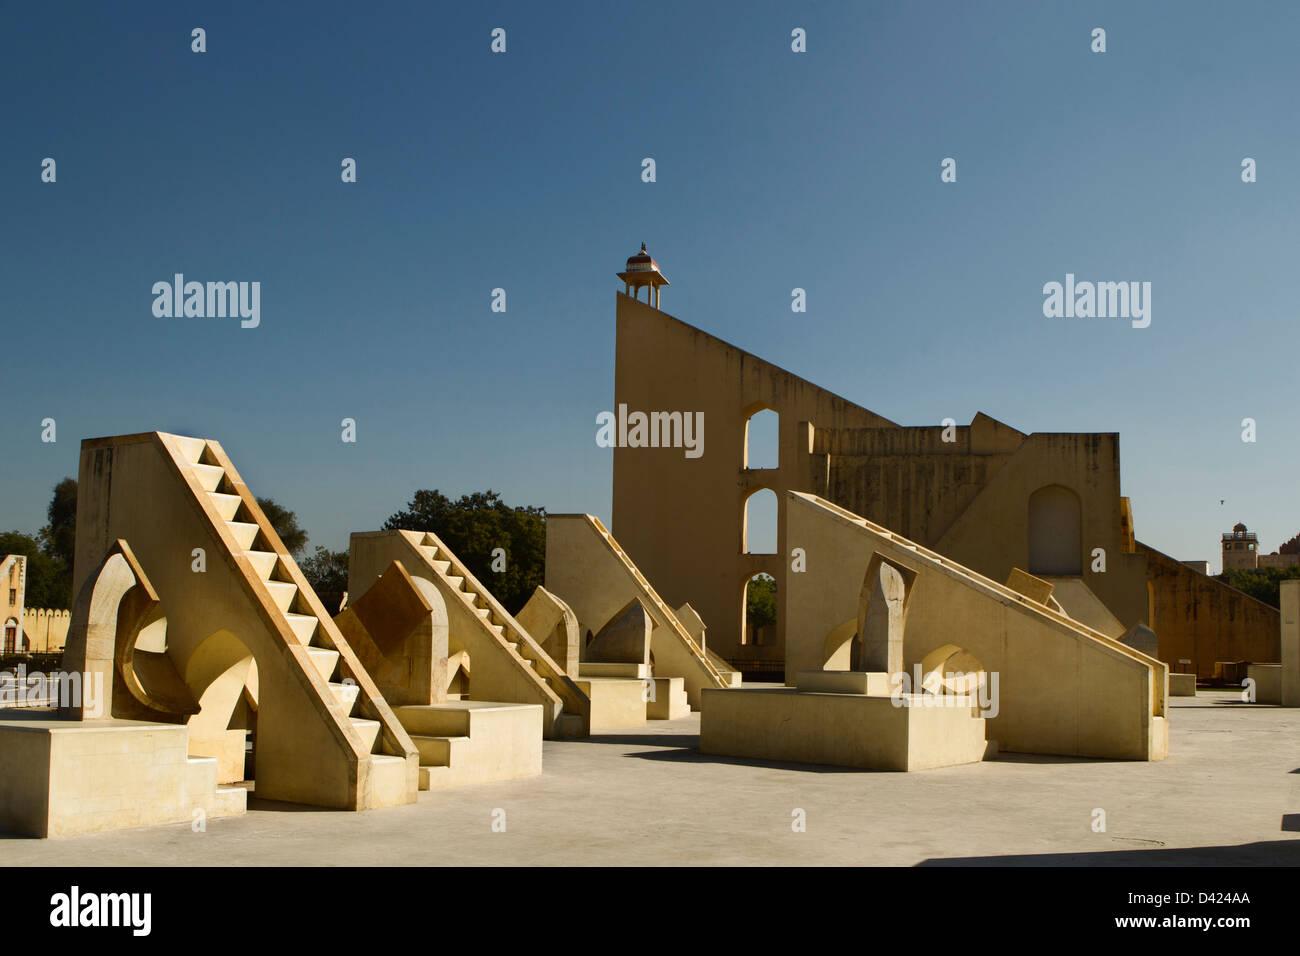 Jantar Mantar Observatory Immagini Stock